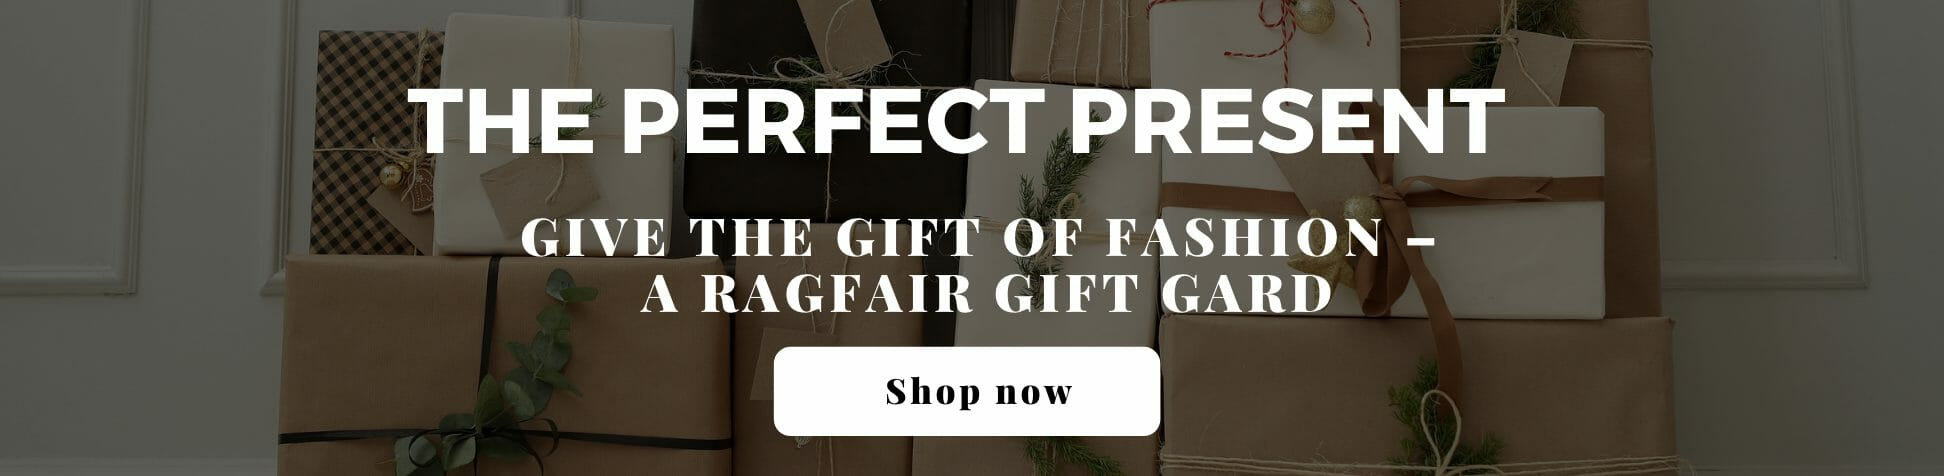 Give a RAGAFiR Gift Card